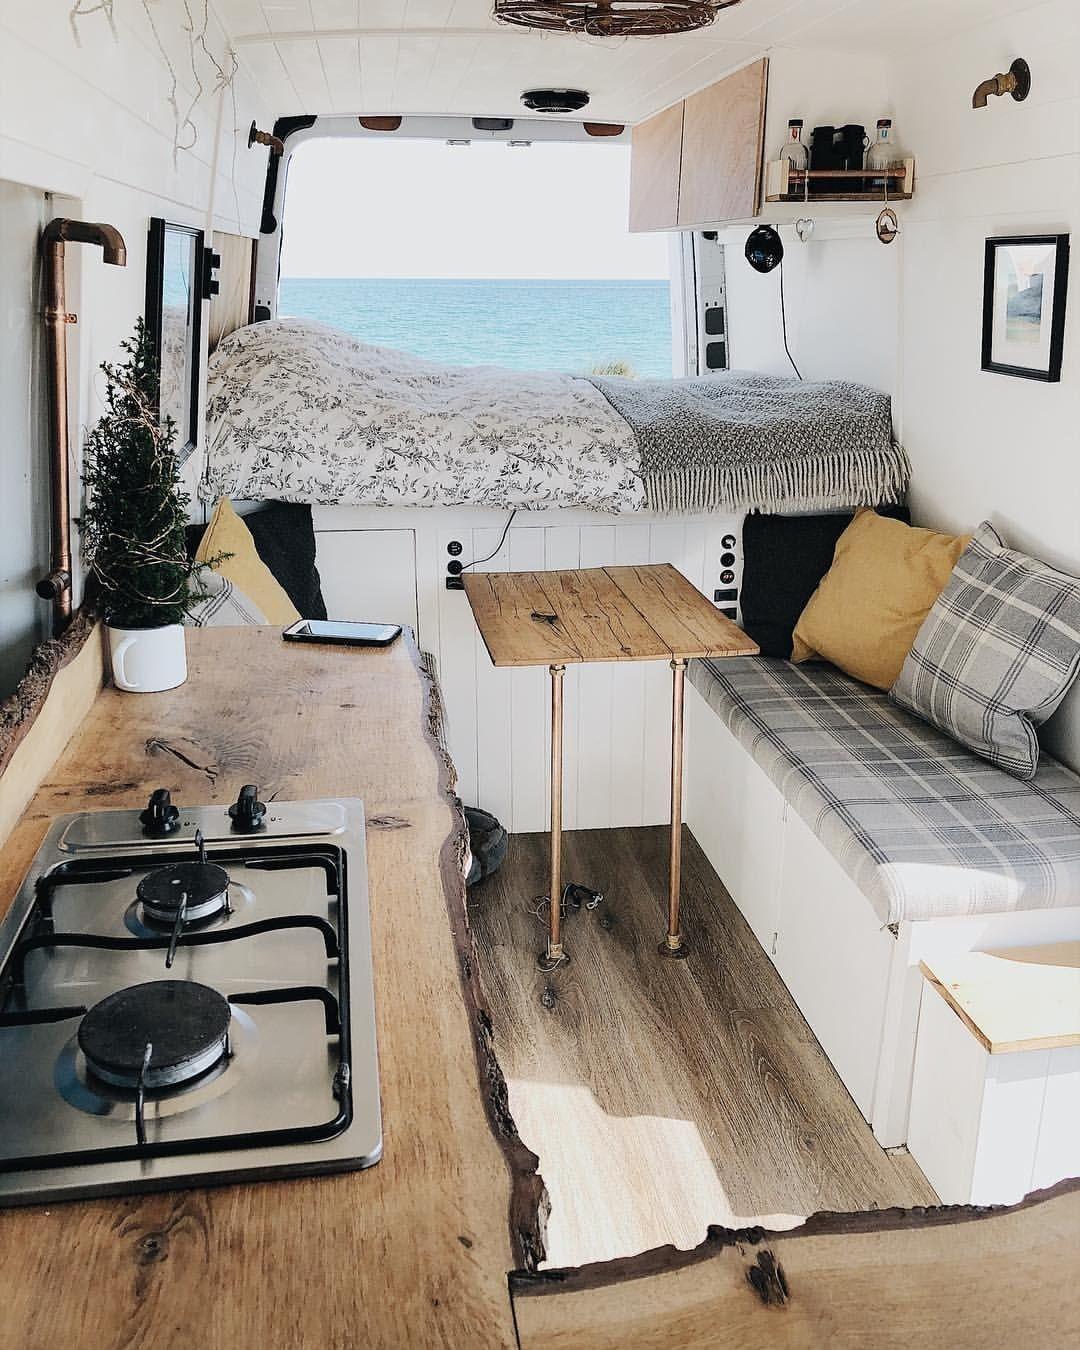 15 Best Diy Campervan Conversion With Images Camper Van